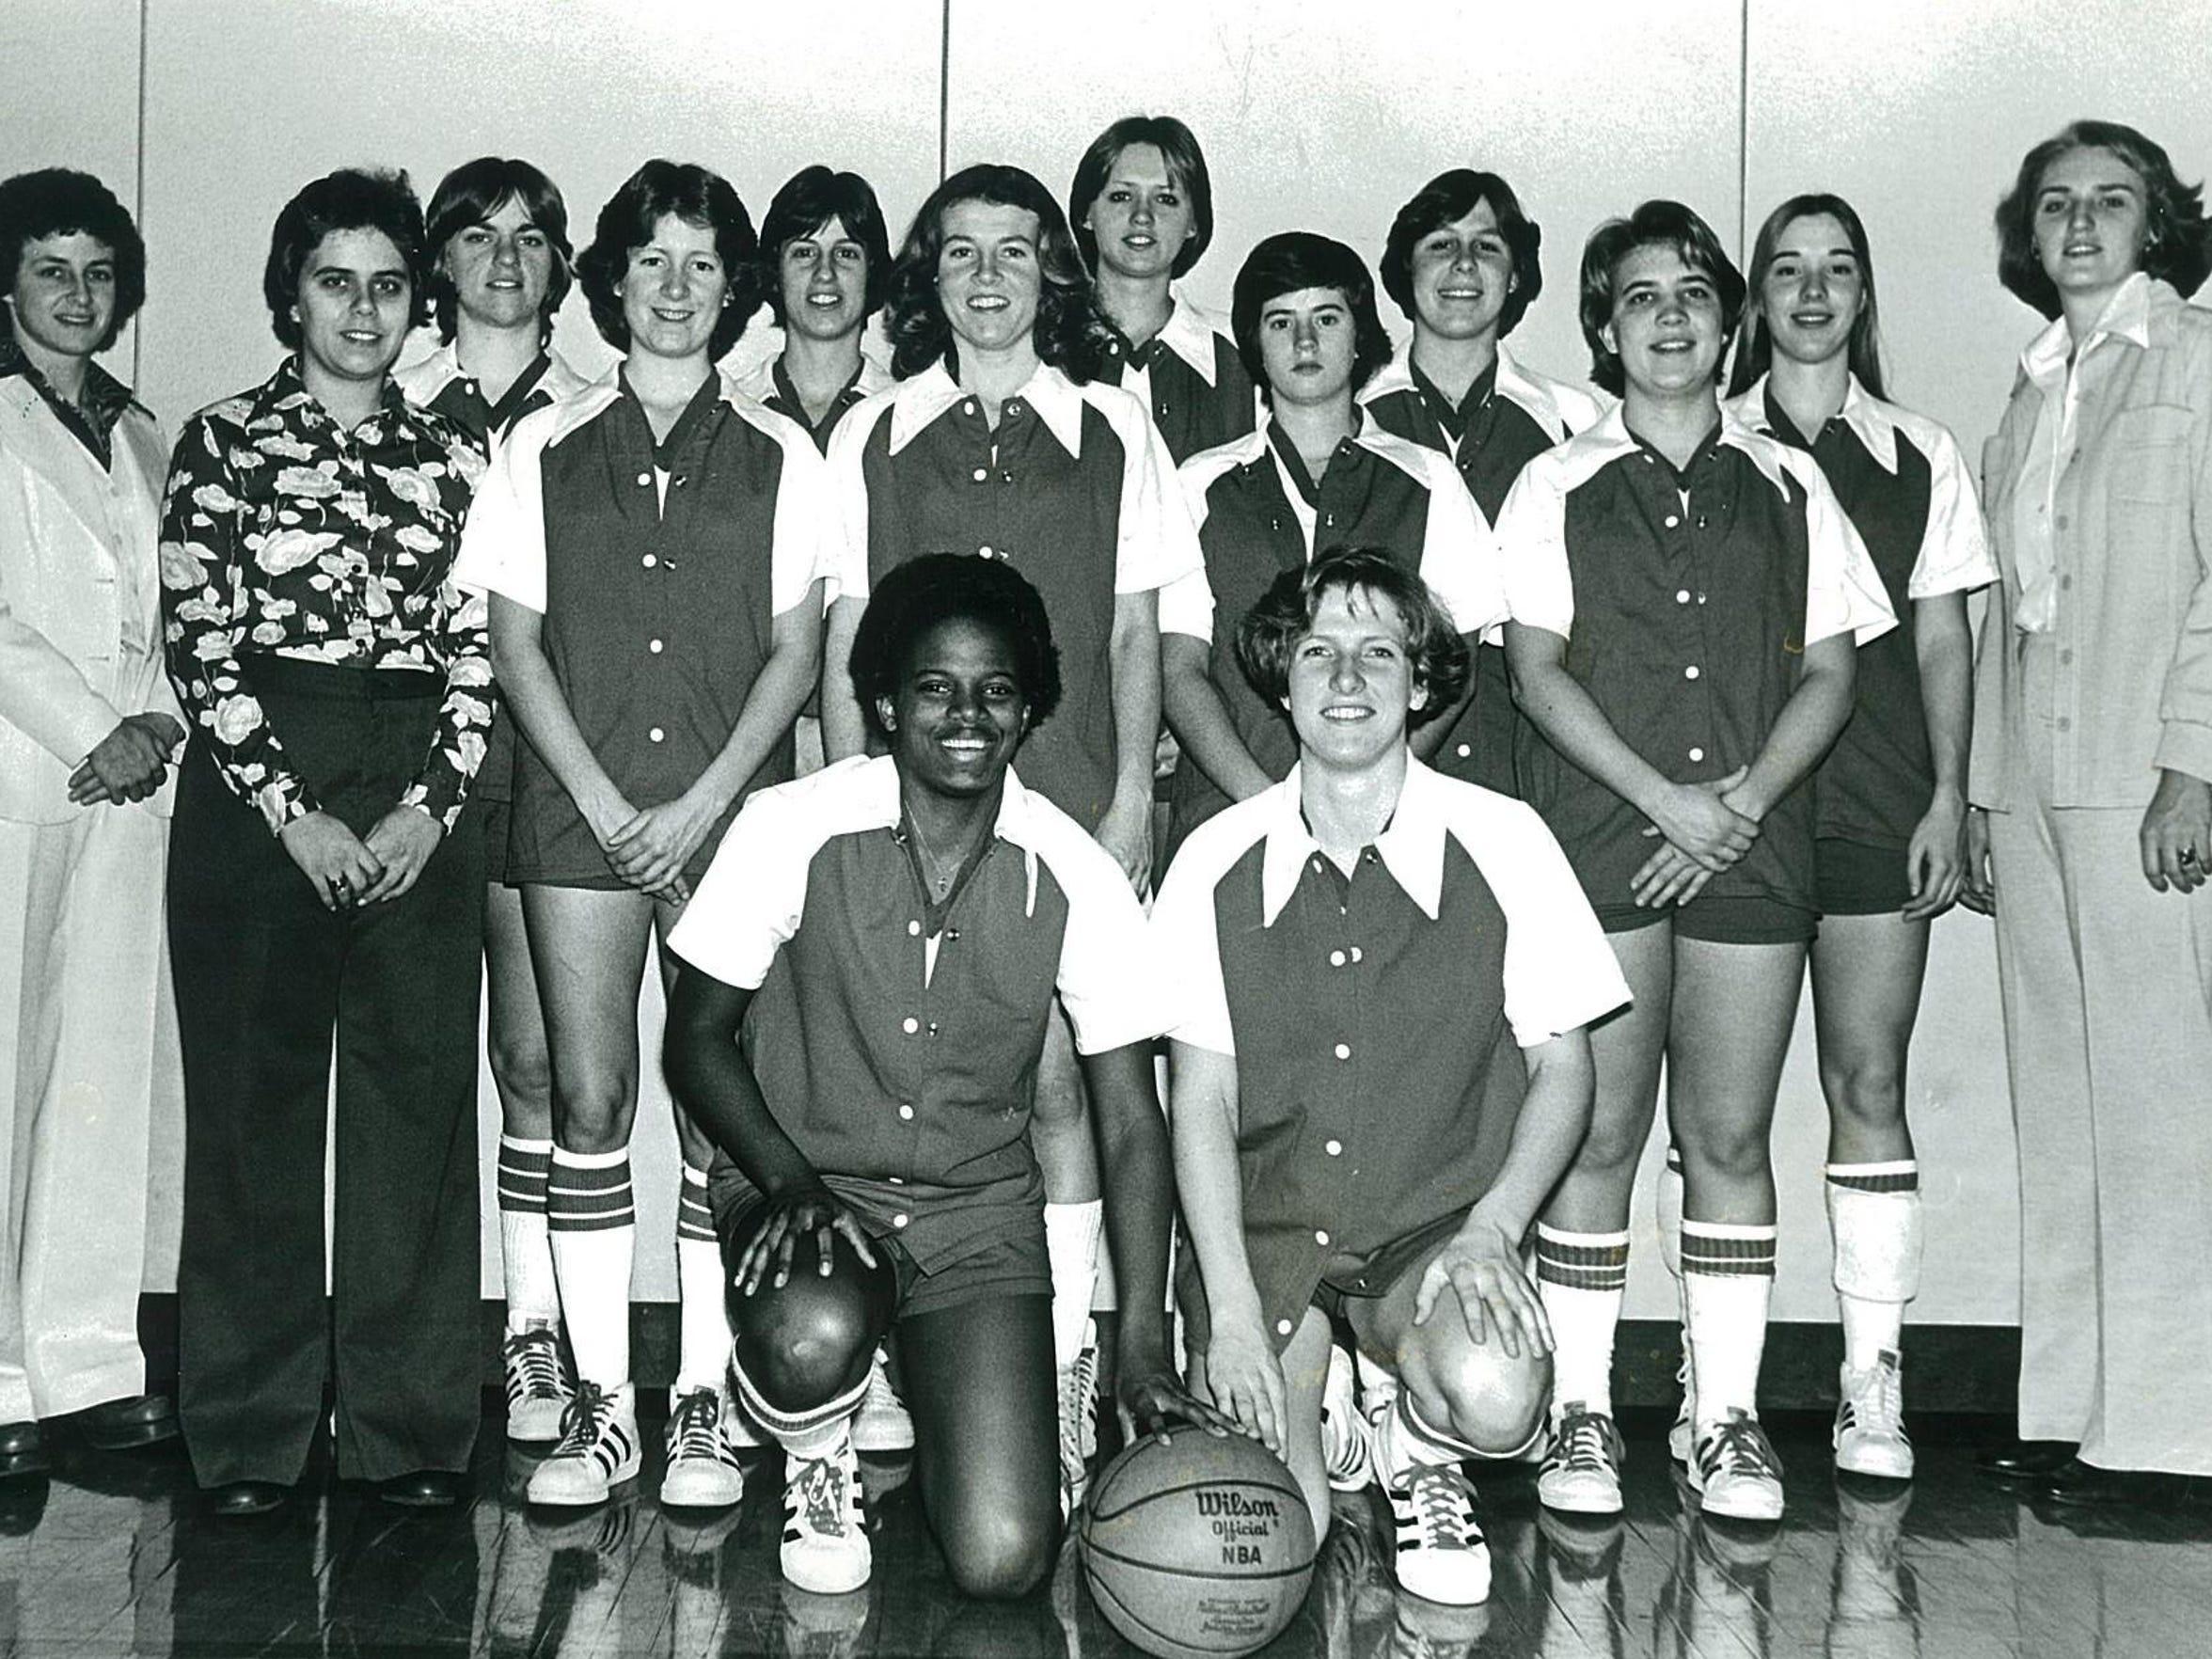 The 1976-77 Rutgers women's basketball team, after